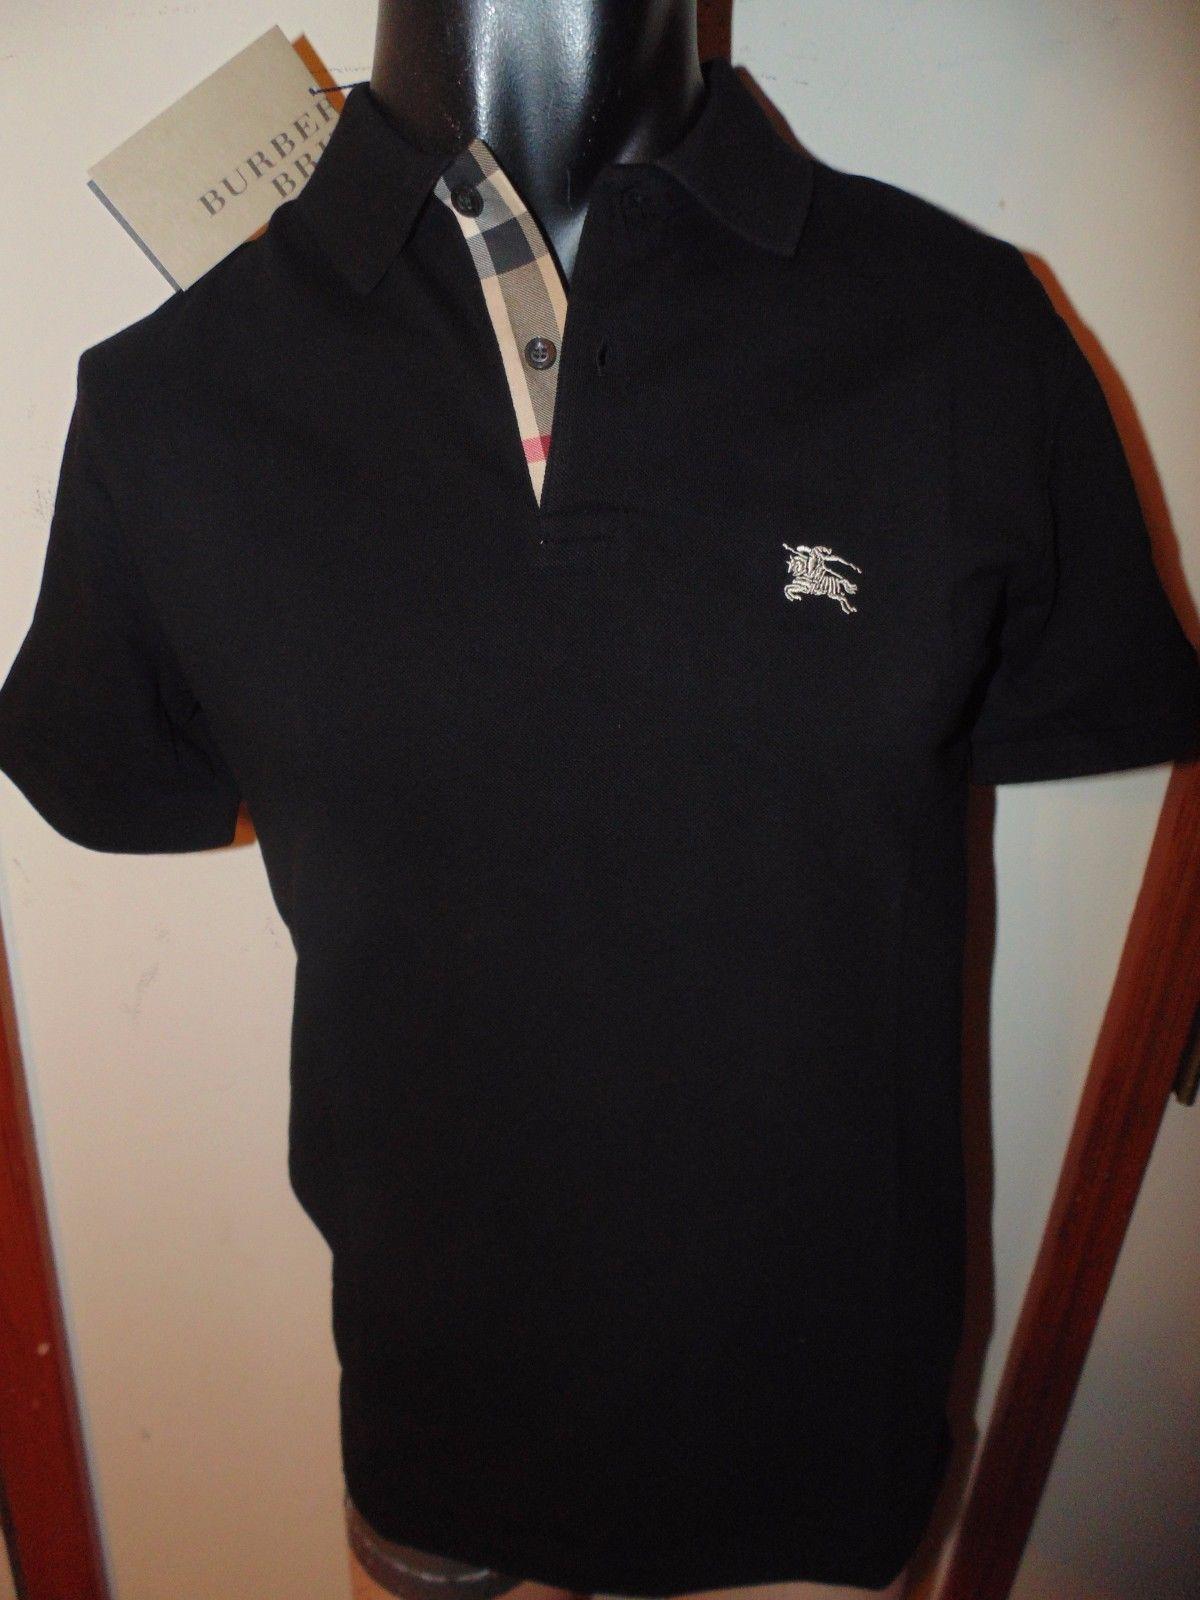 Casual Shirts 57990  Burberry Brit Men S Black Short Sleeve Nova Check  Placket Polo Shirt S M L Xl -  BUY IT NOW ONLY   80 on eBay! 7259bb61835f